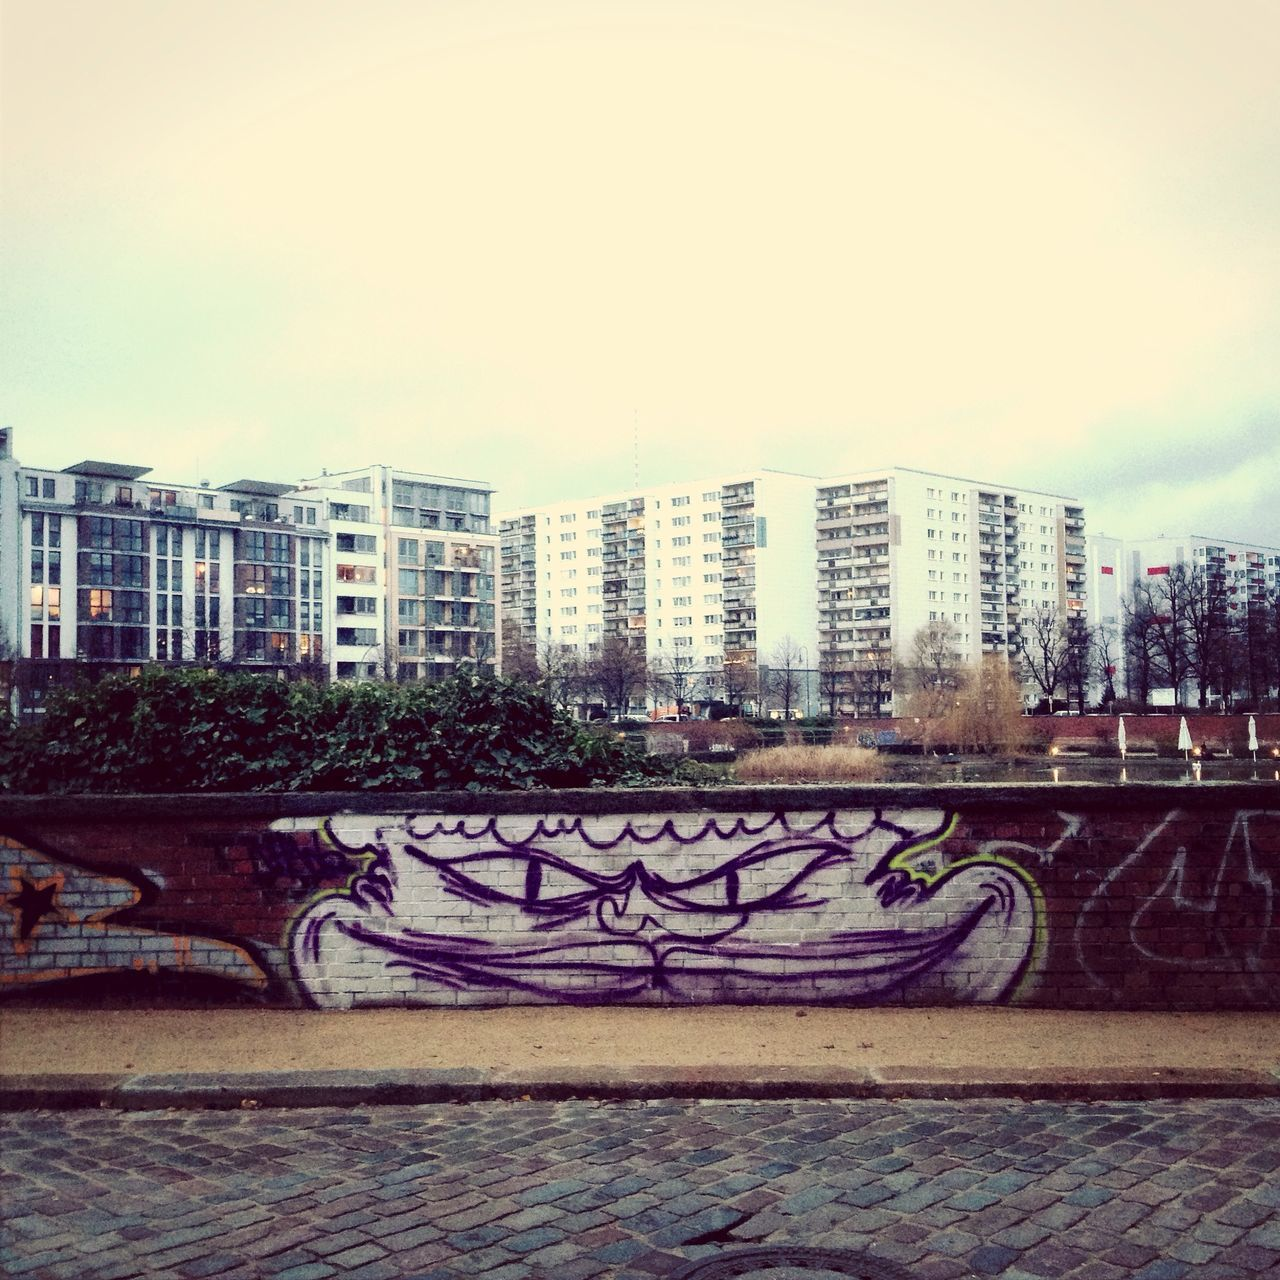 Graffiti Urban Geometry Urban Landscape Street Photography